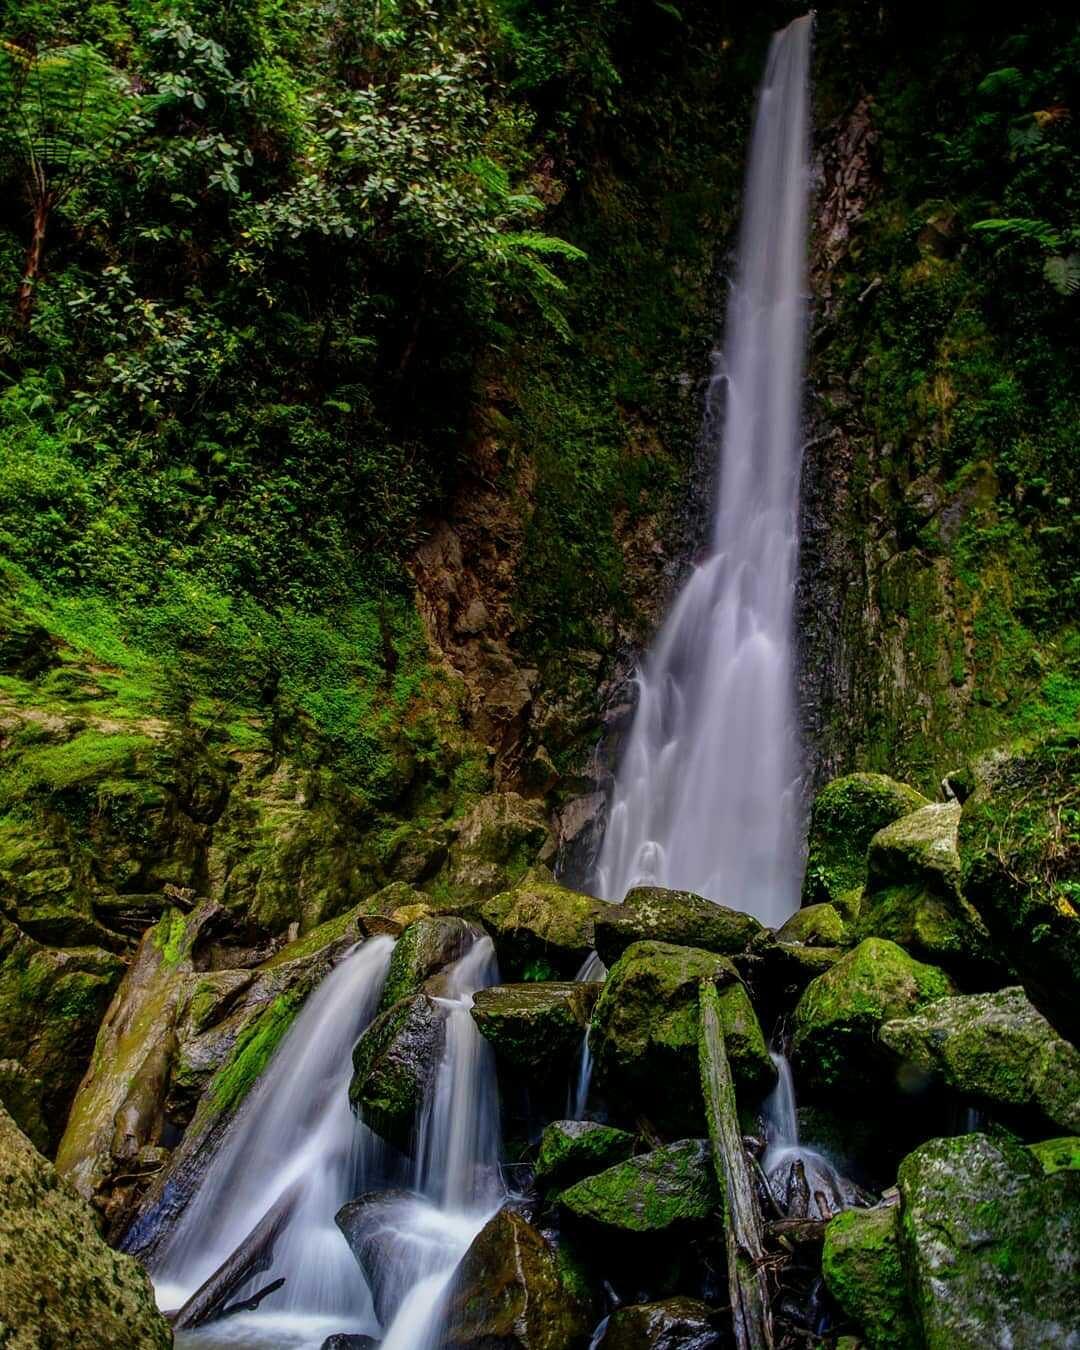 Air Terjun Pangaribuan – Palipi , Siap Menjadi Salah satu Spot Wisata Andalan Samosir